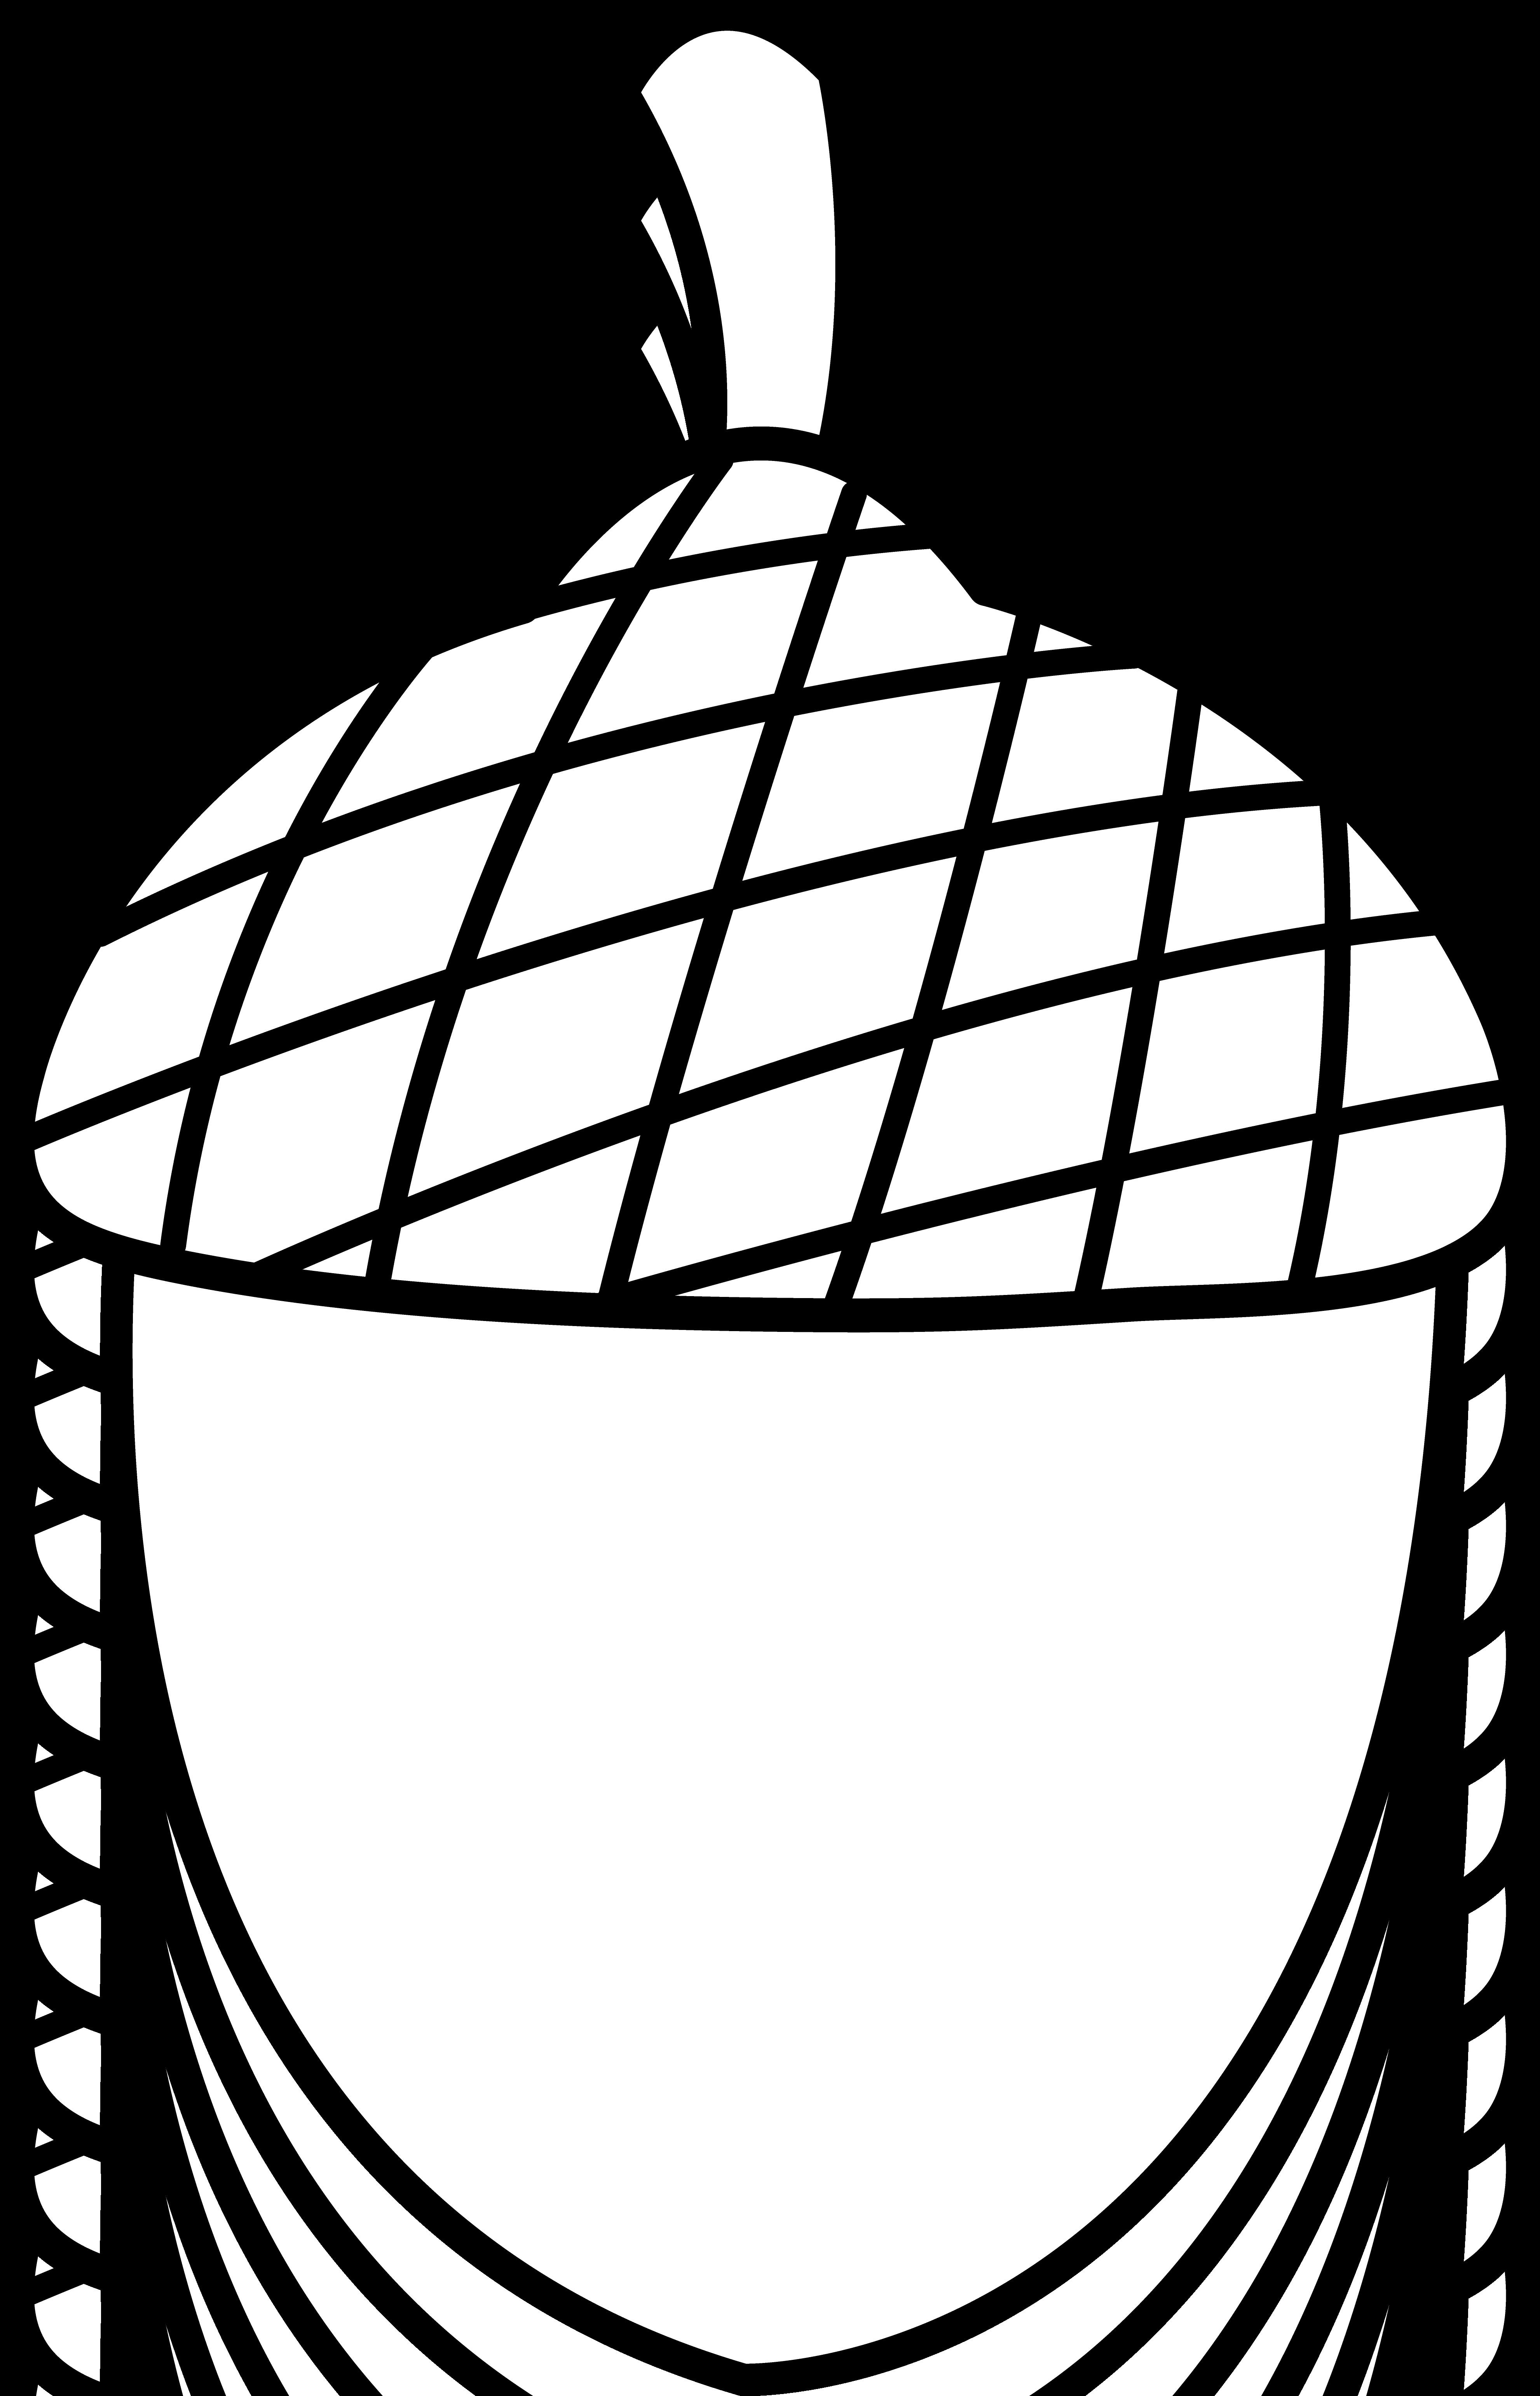 nut clipart-nut clipart-6